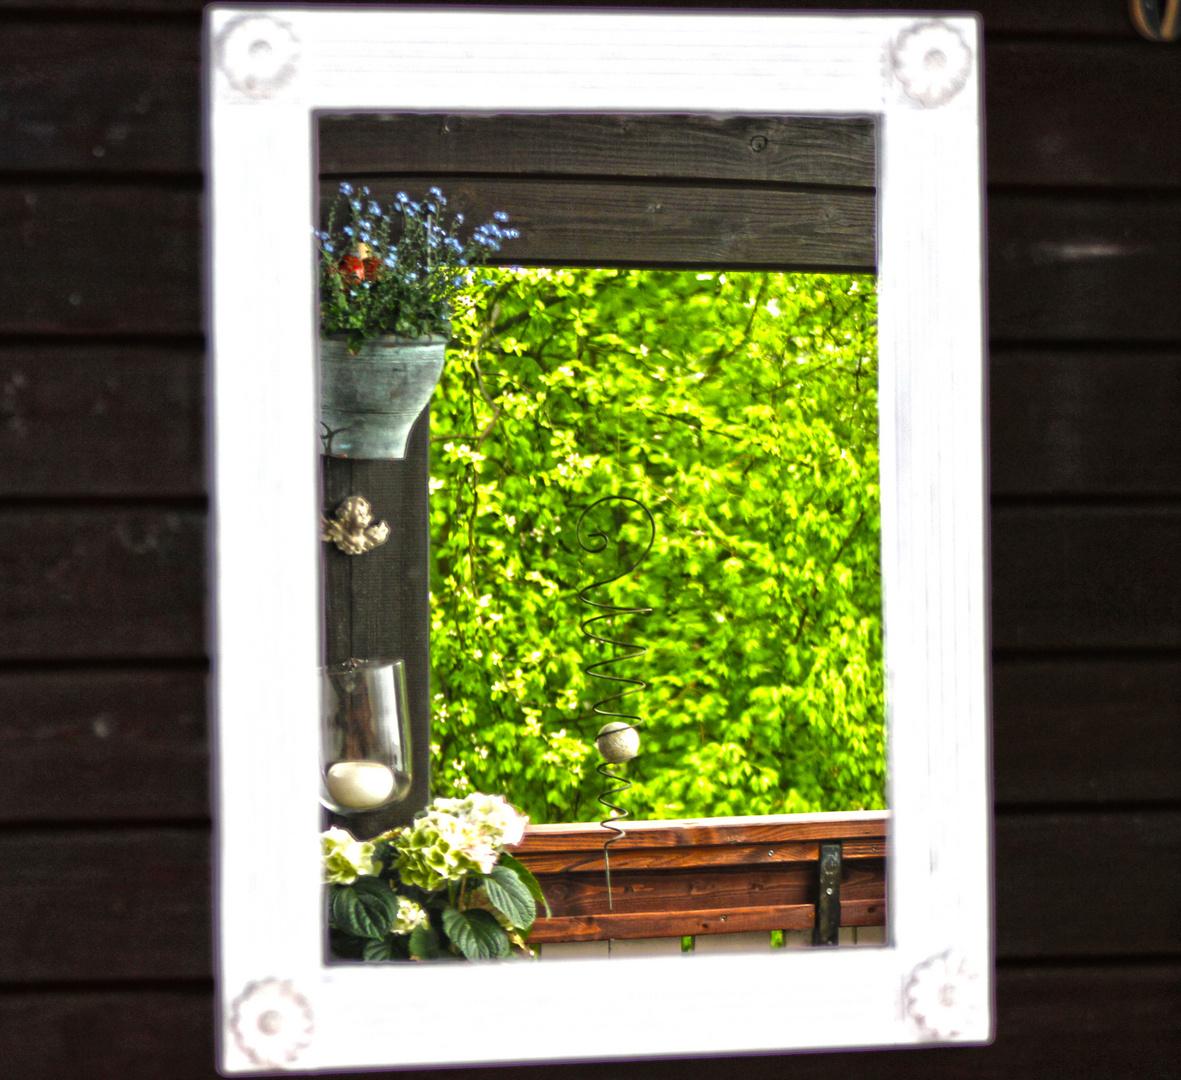 Spiegel im Rahmen? ~ Foto & Bild | projekte, kreativ- projekte ...